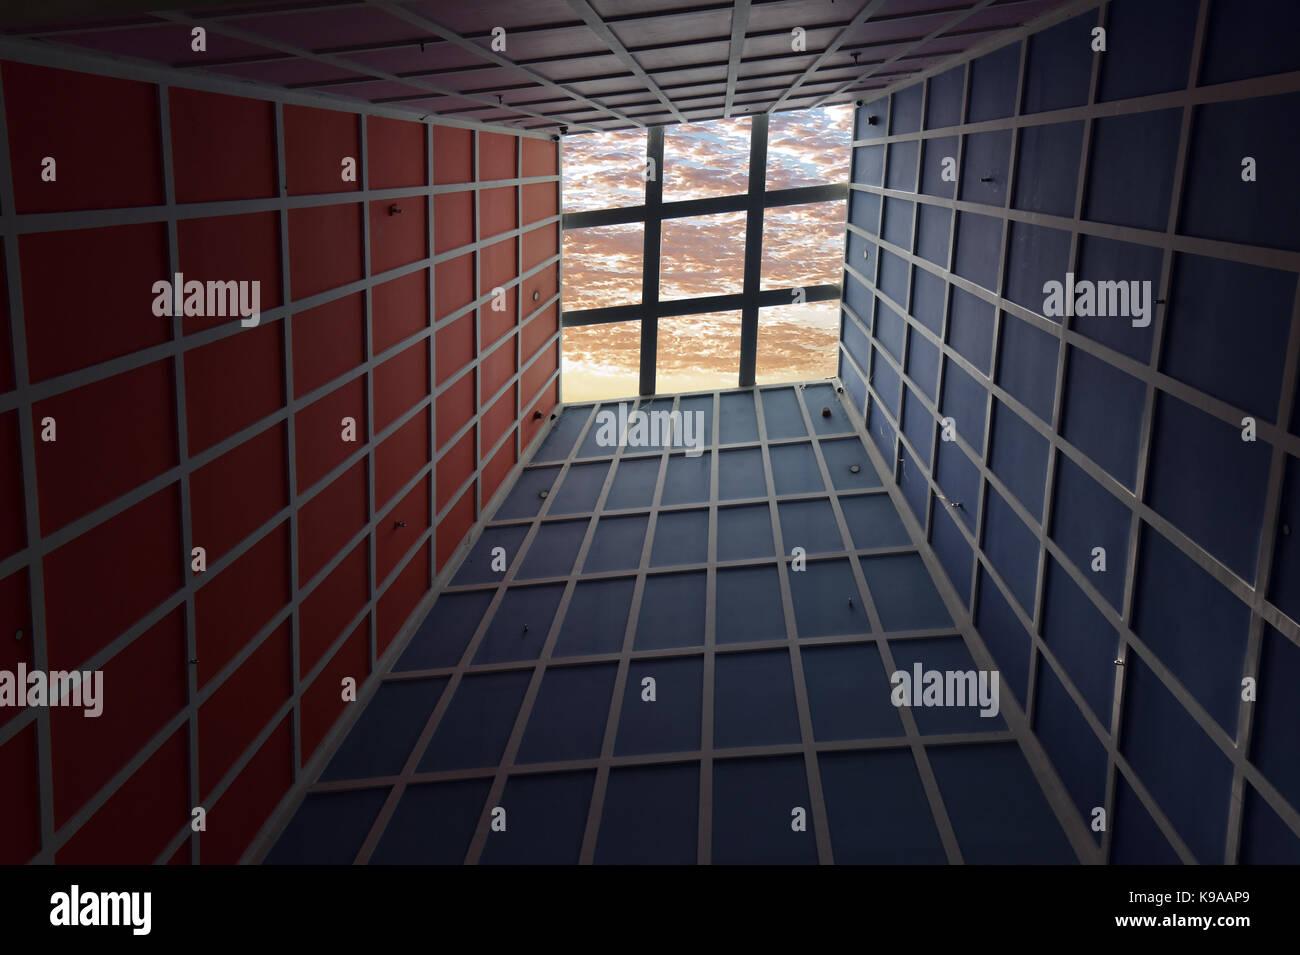 Windows - Stock Image